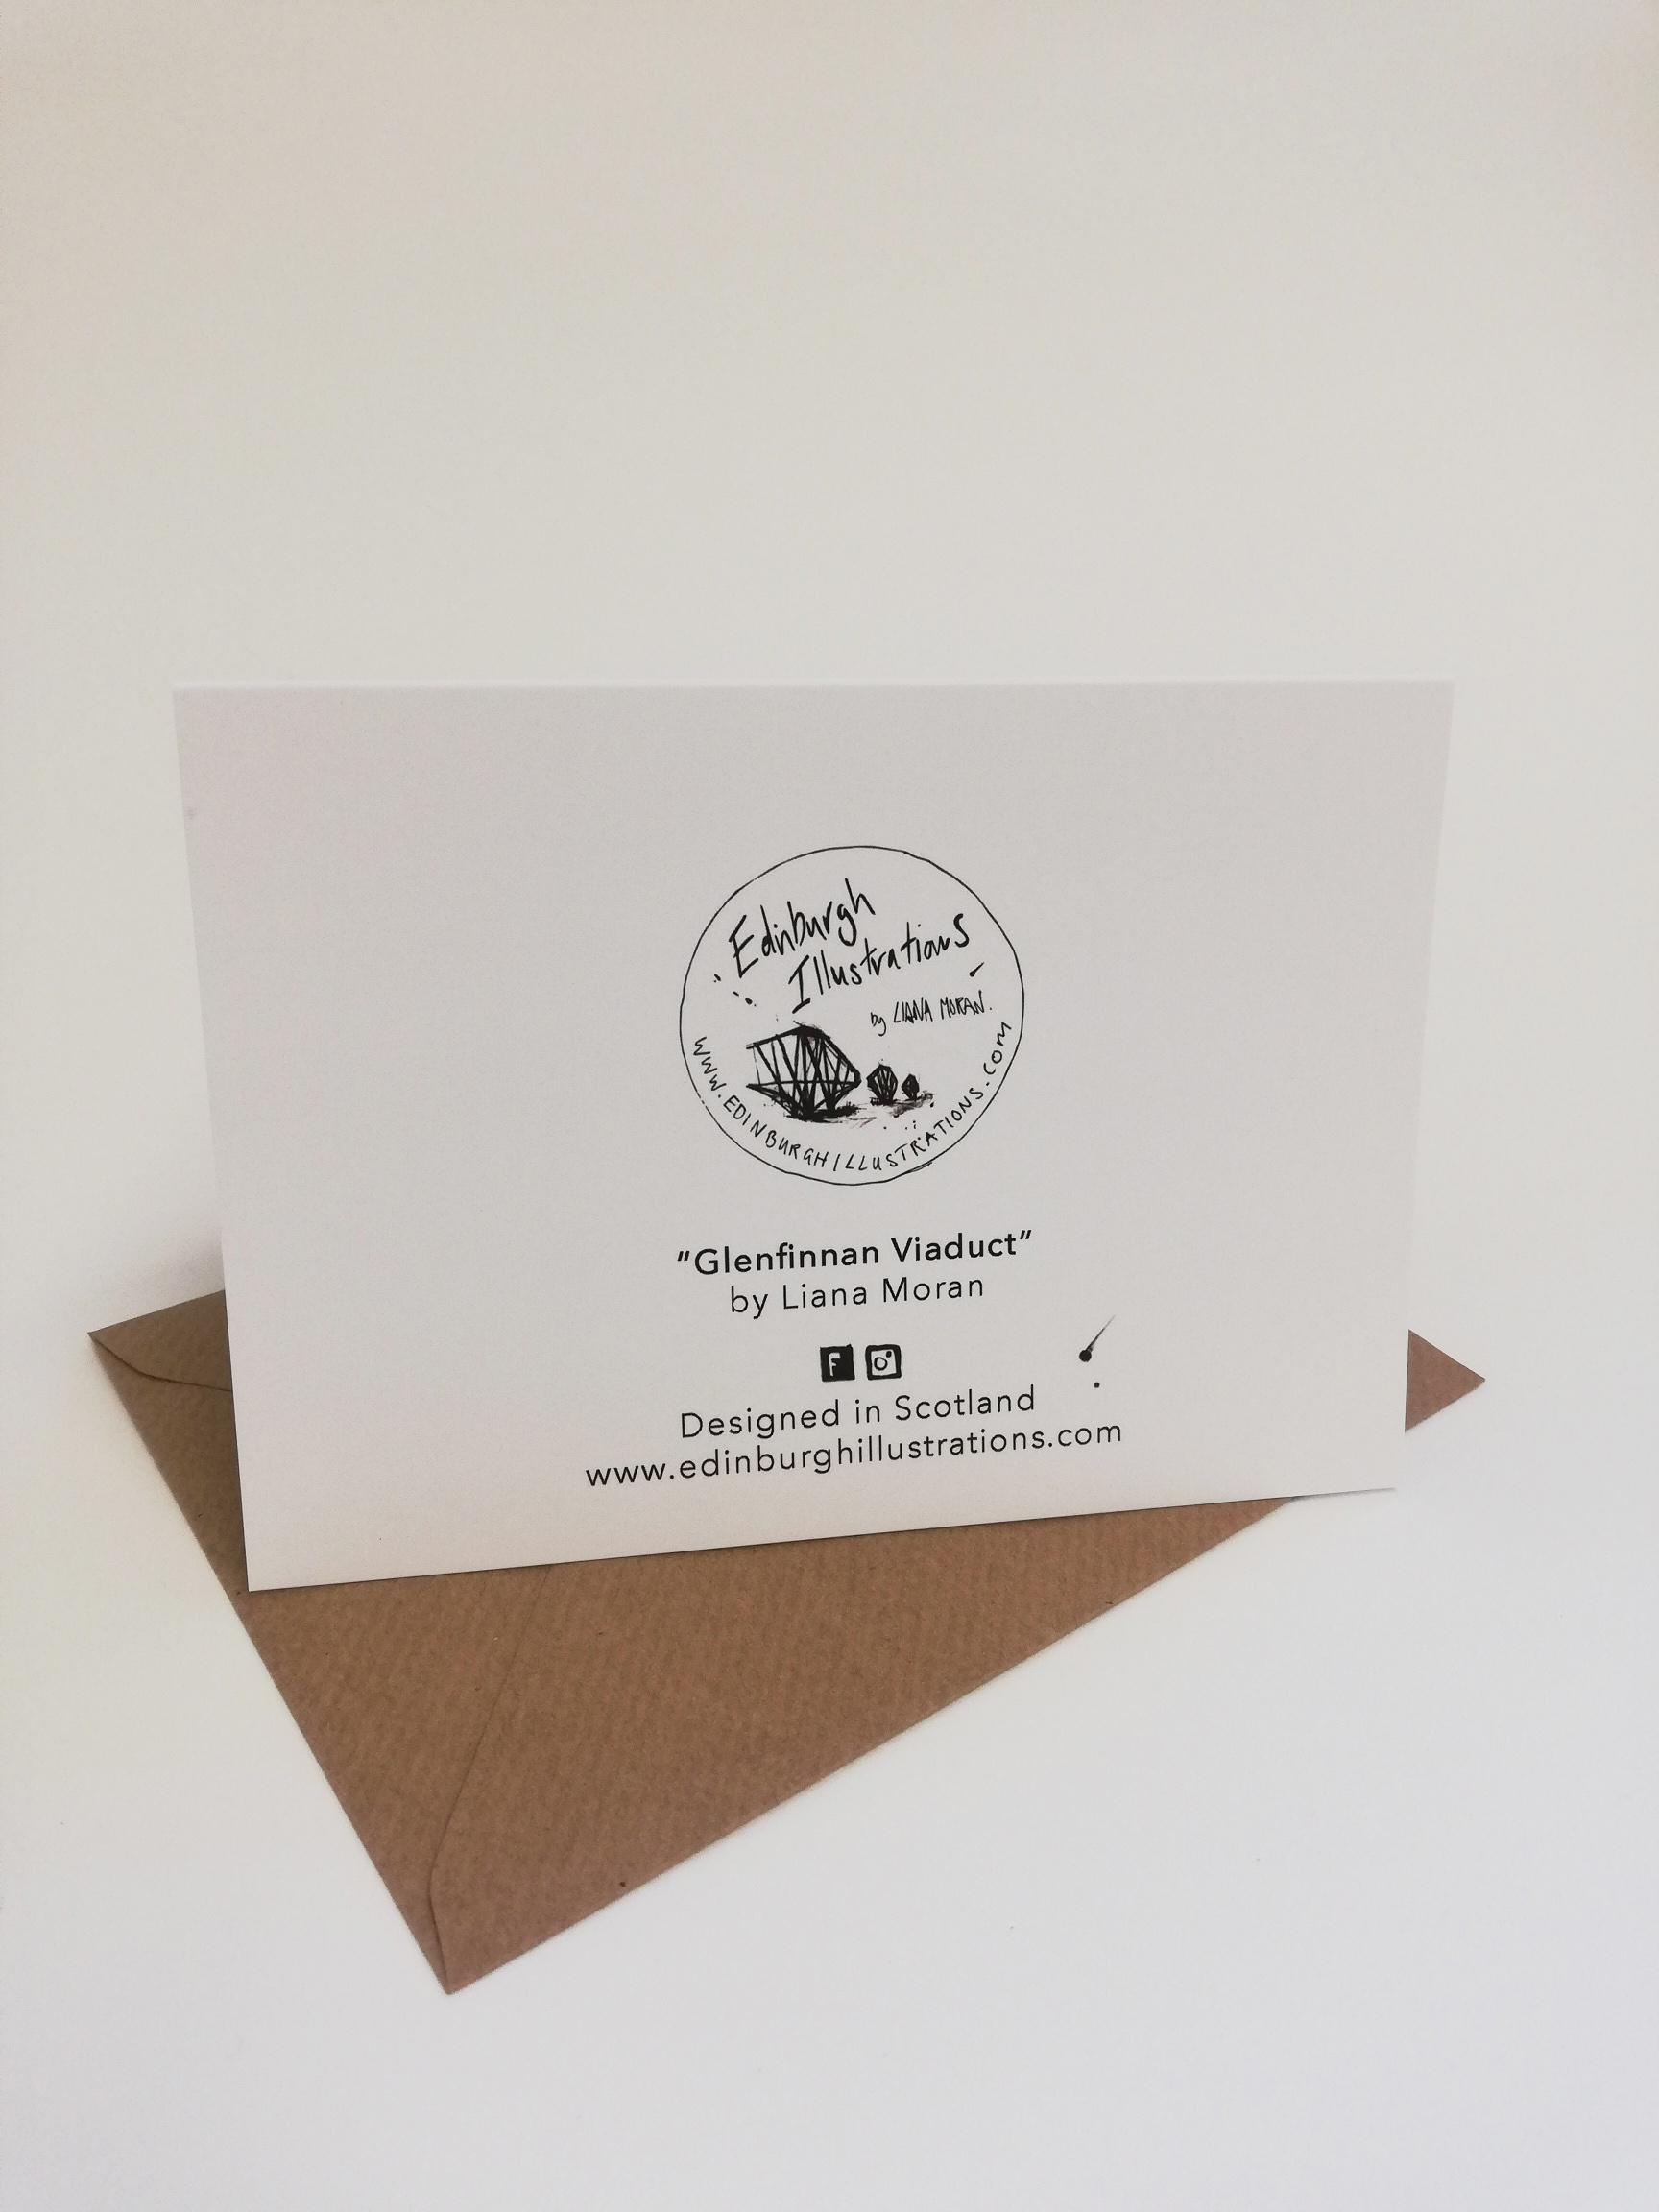 Glenfinnan Viaduct card